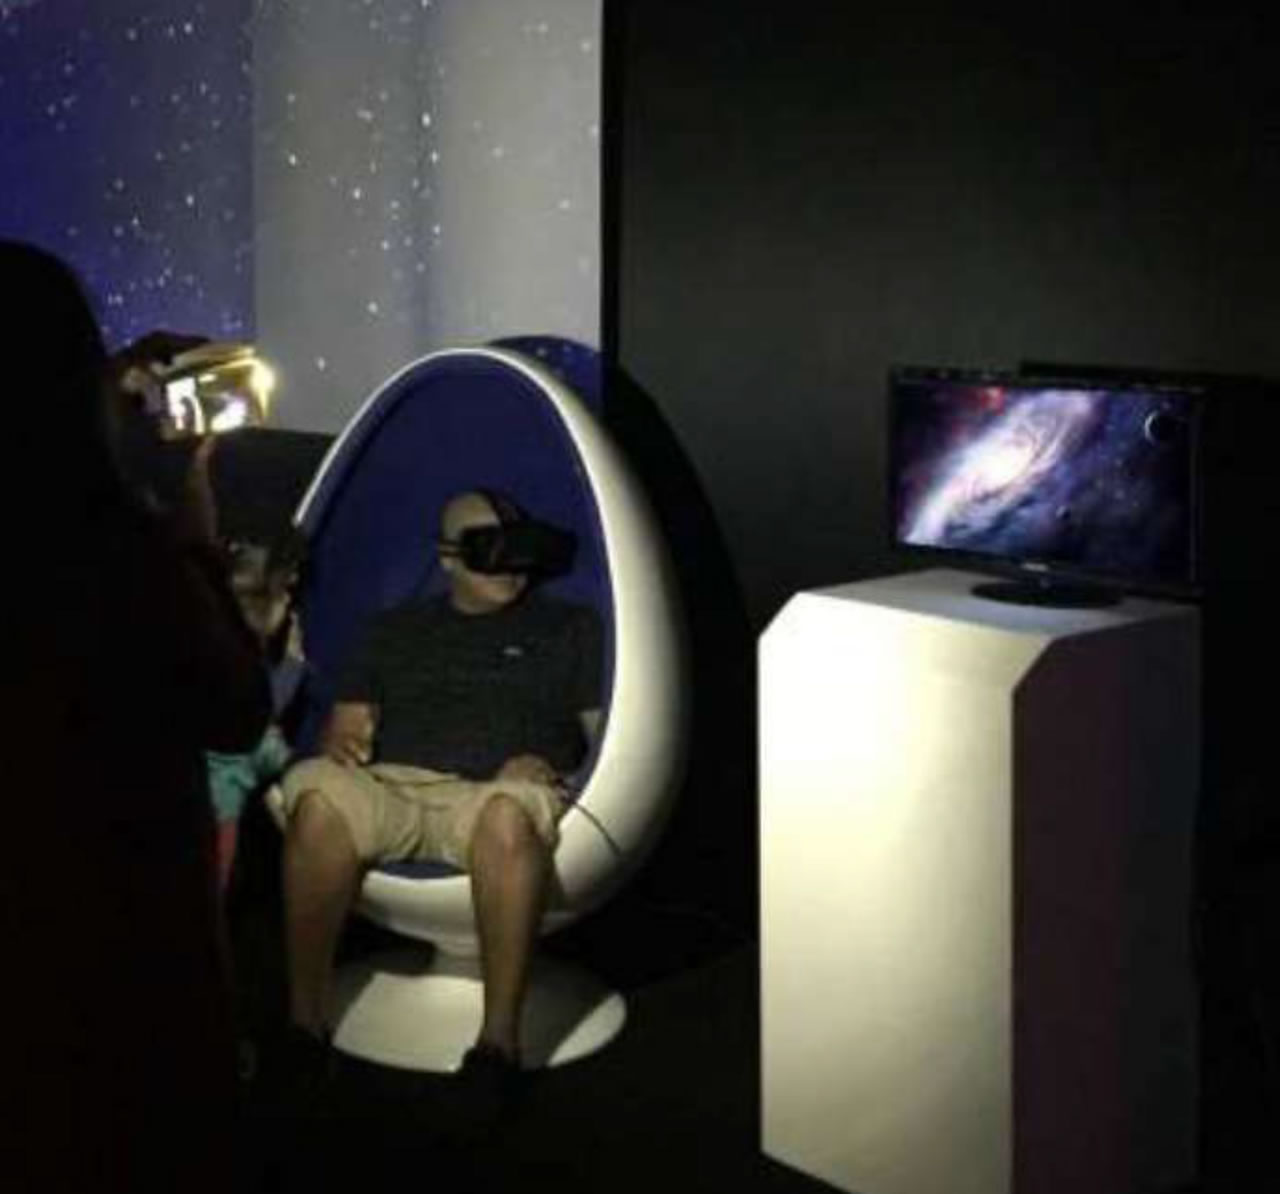 Göklerdeyim Konsepti - Big Bang VR